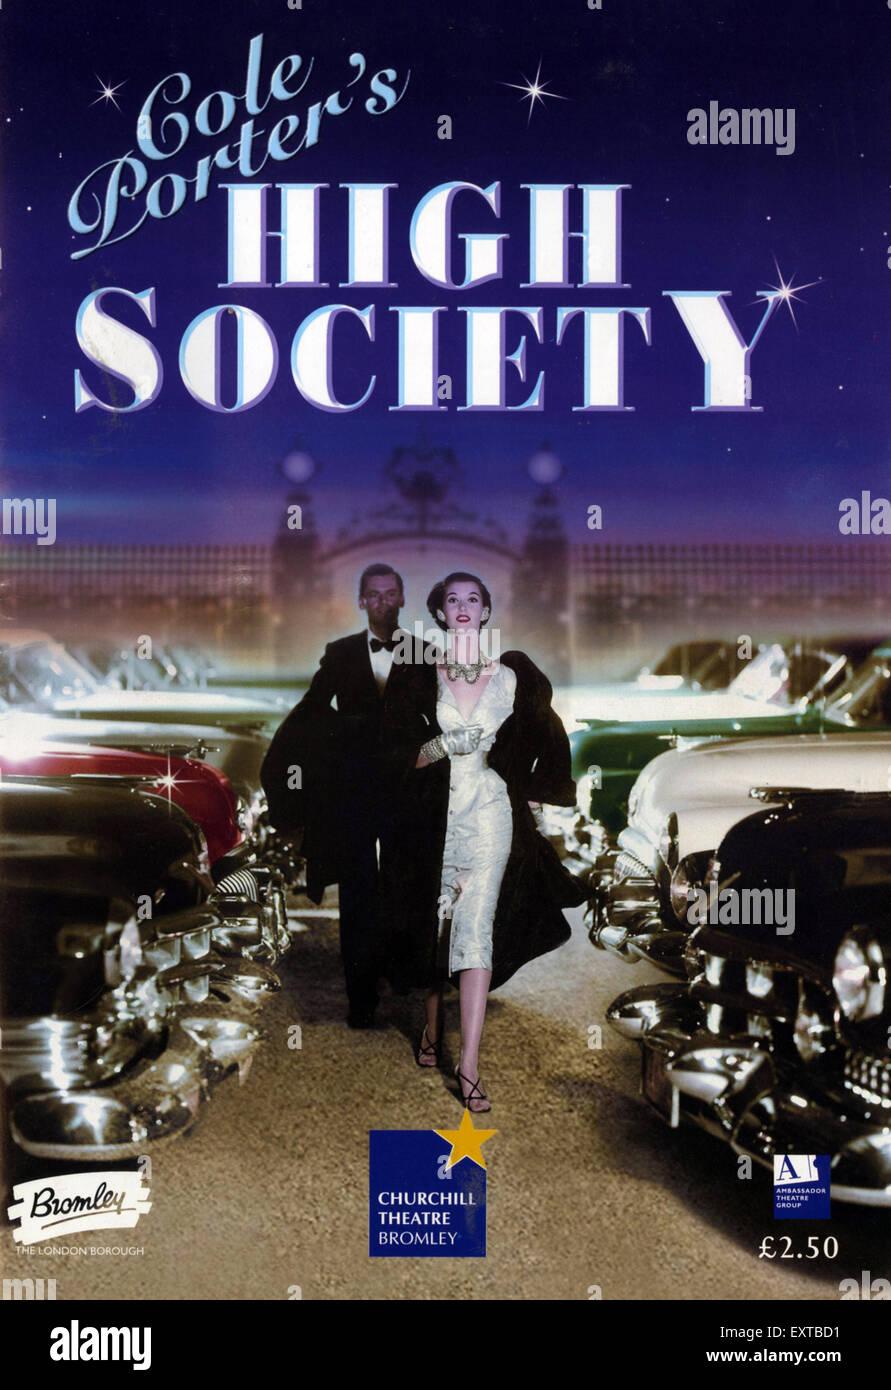 2000s UK High Society Poster - Stock Image